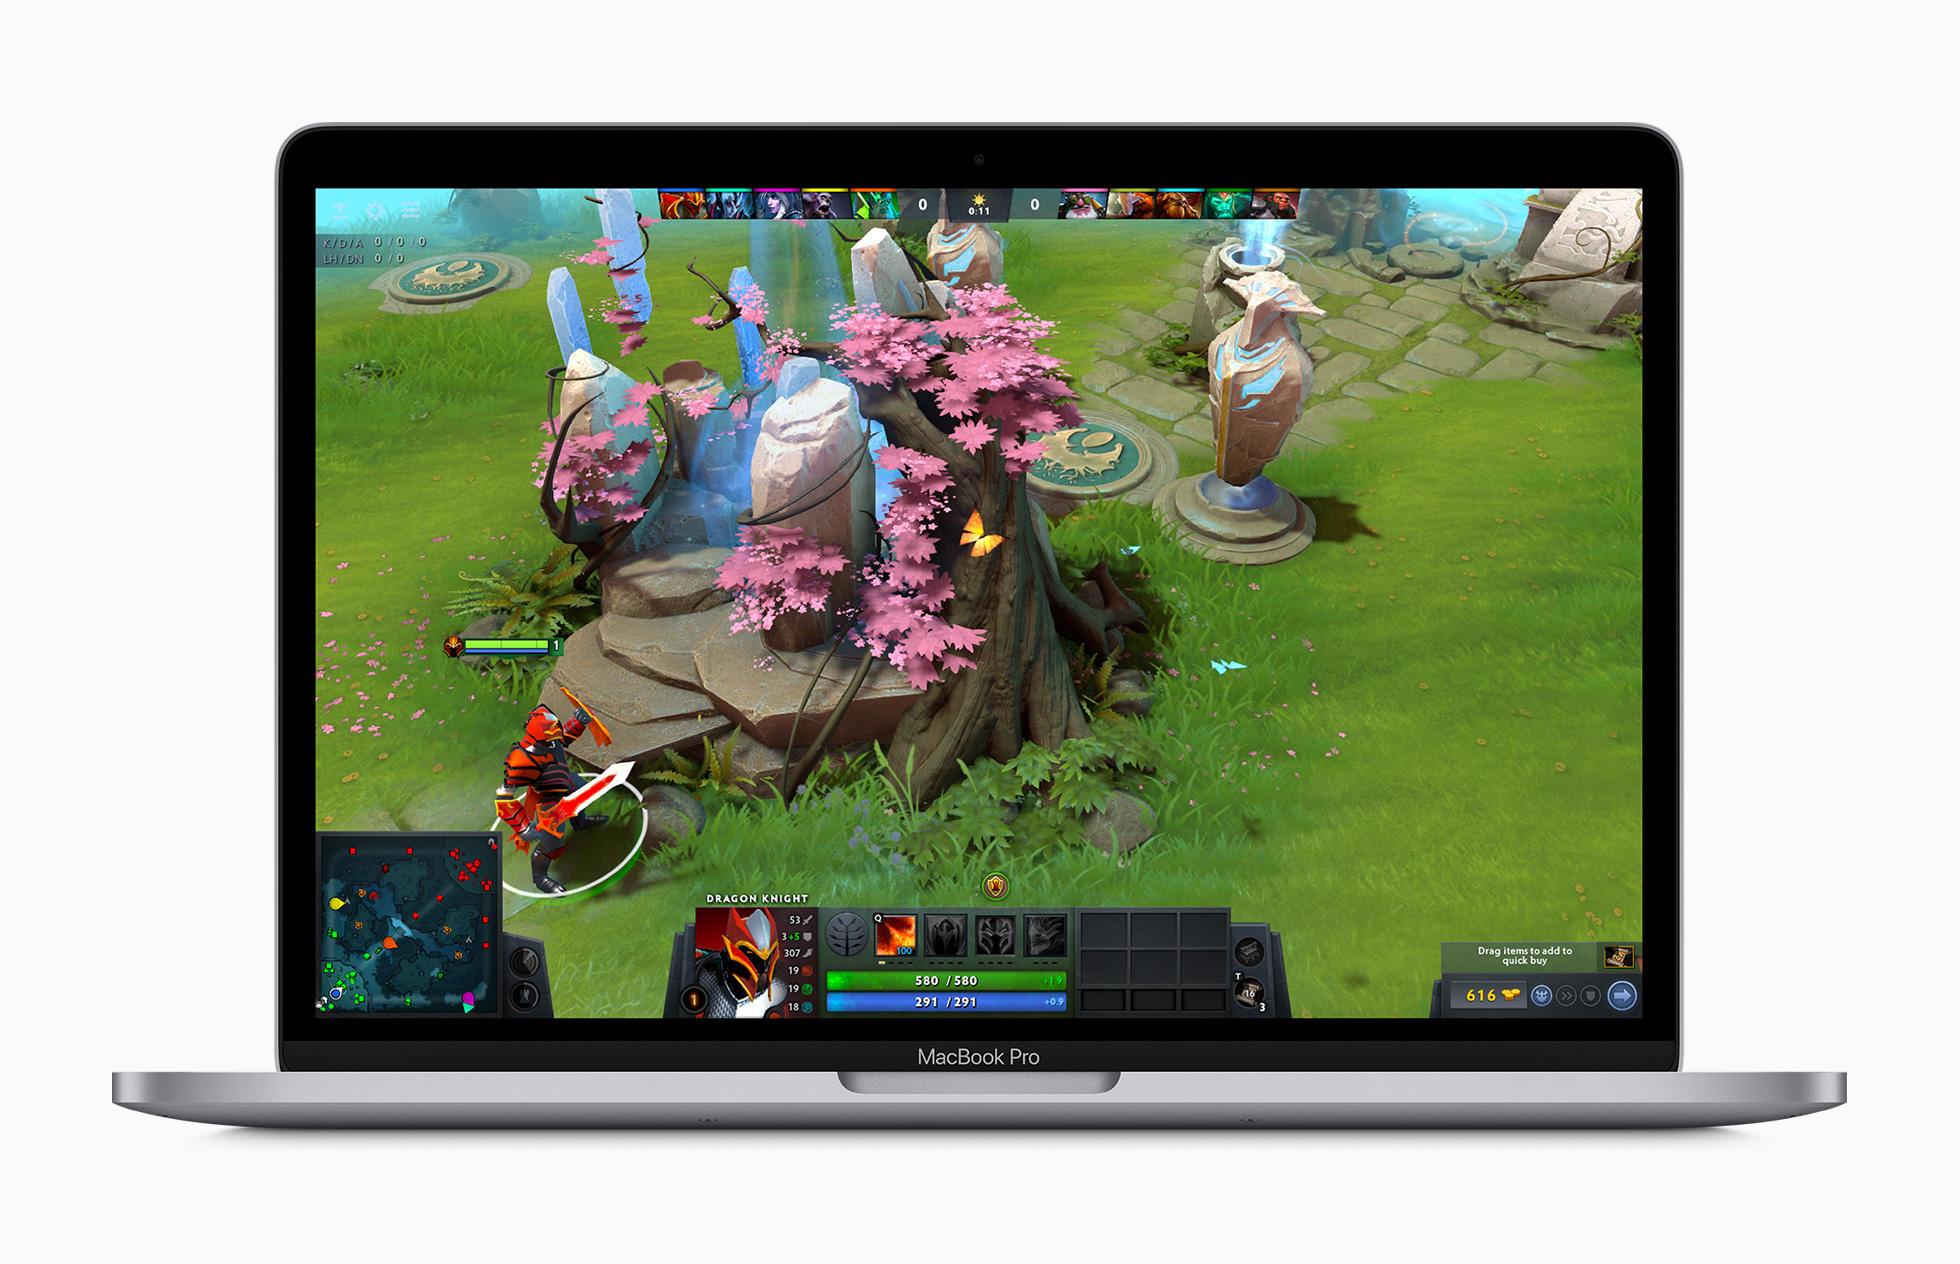 apple-macbook-pro-13-inch-with-dota-2-game-screen-05042020.jpg